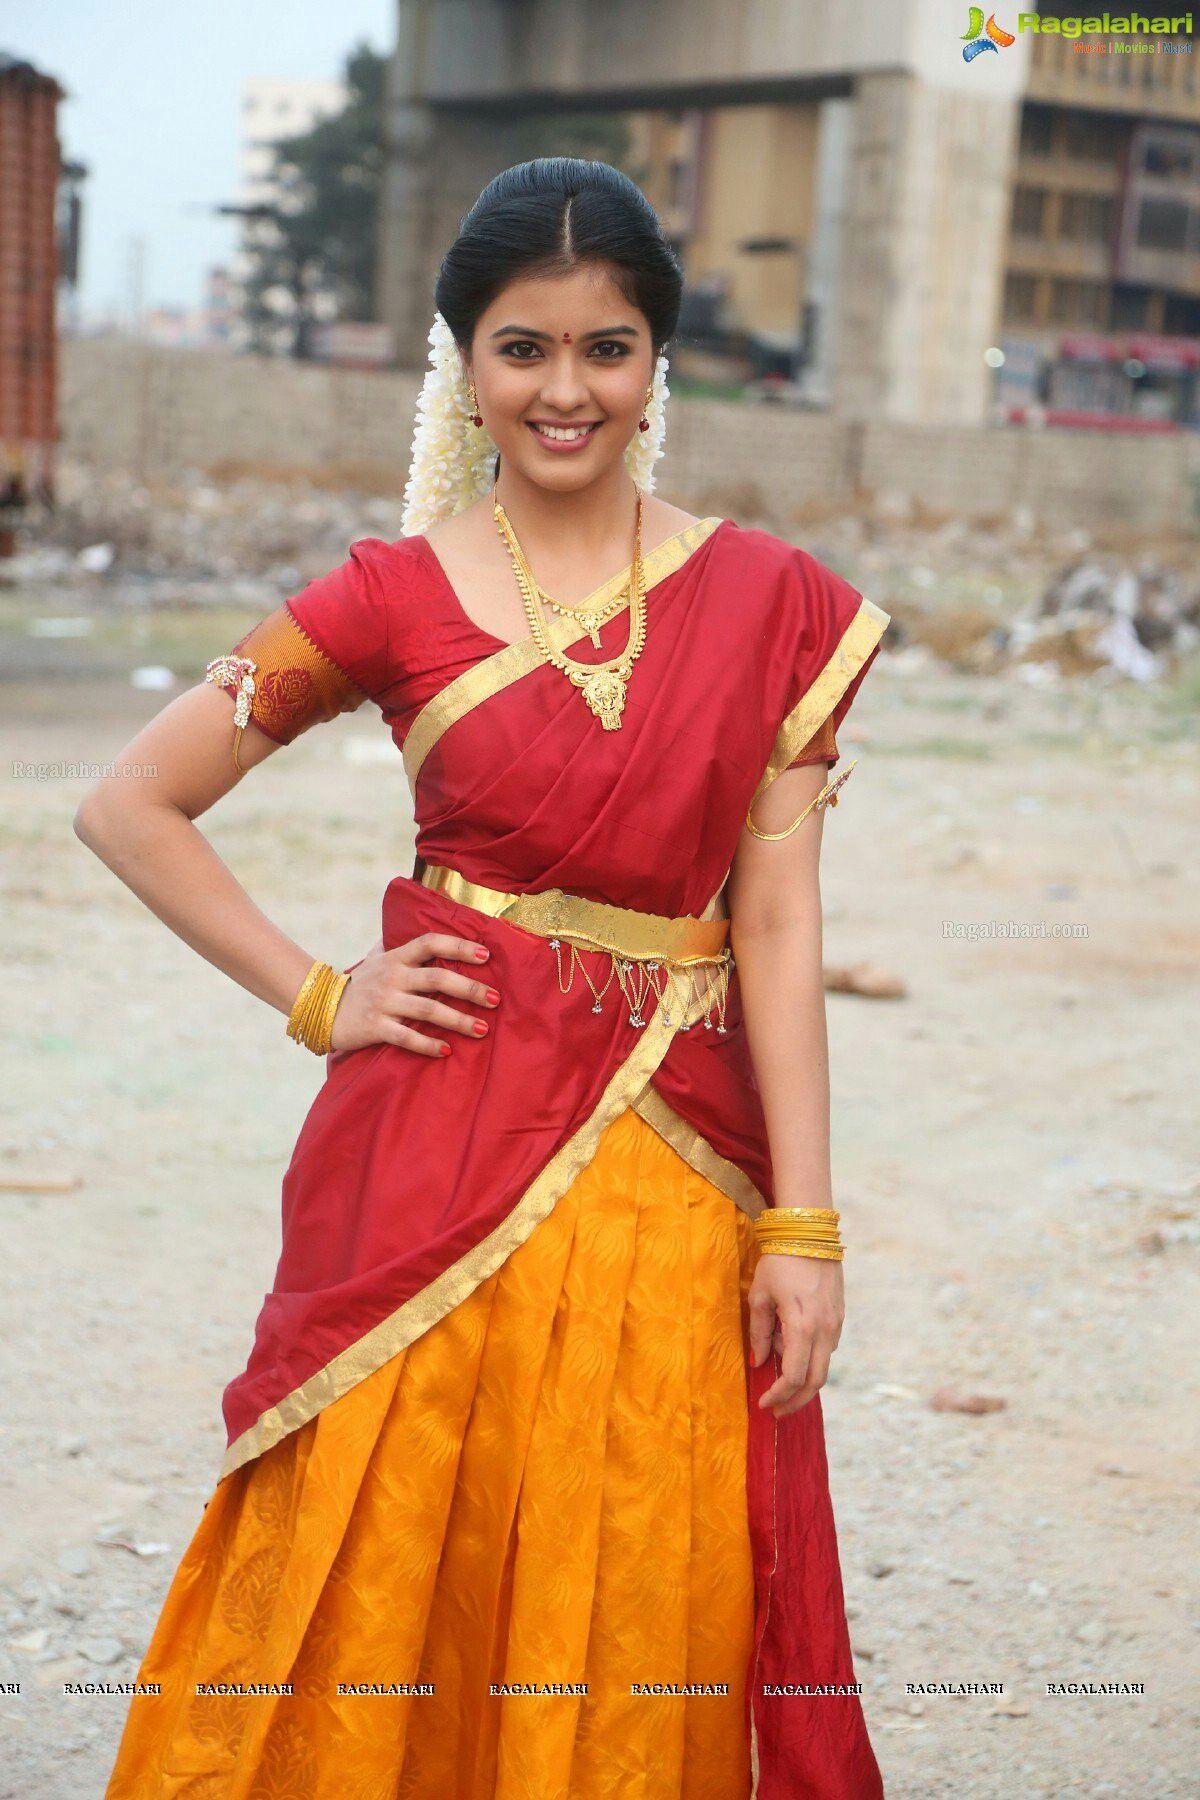 Amrutha India Beauty Women Beautiful Indian Actress Indian Girls Images